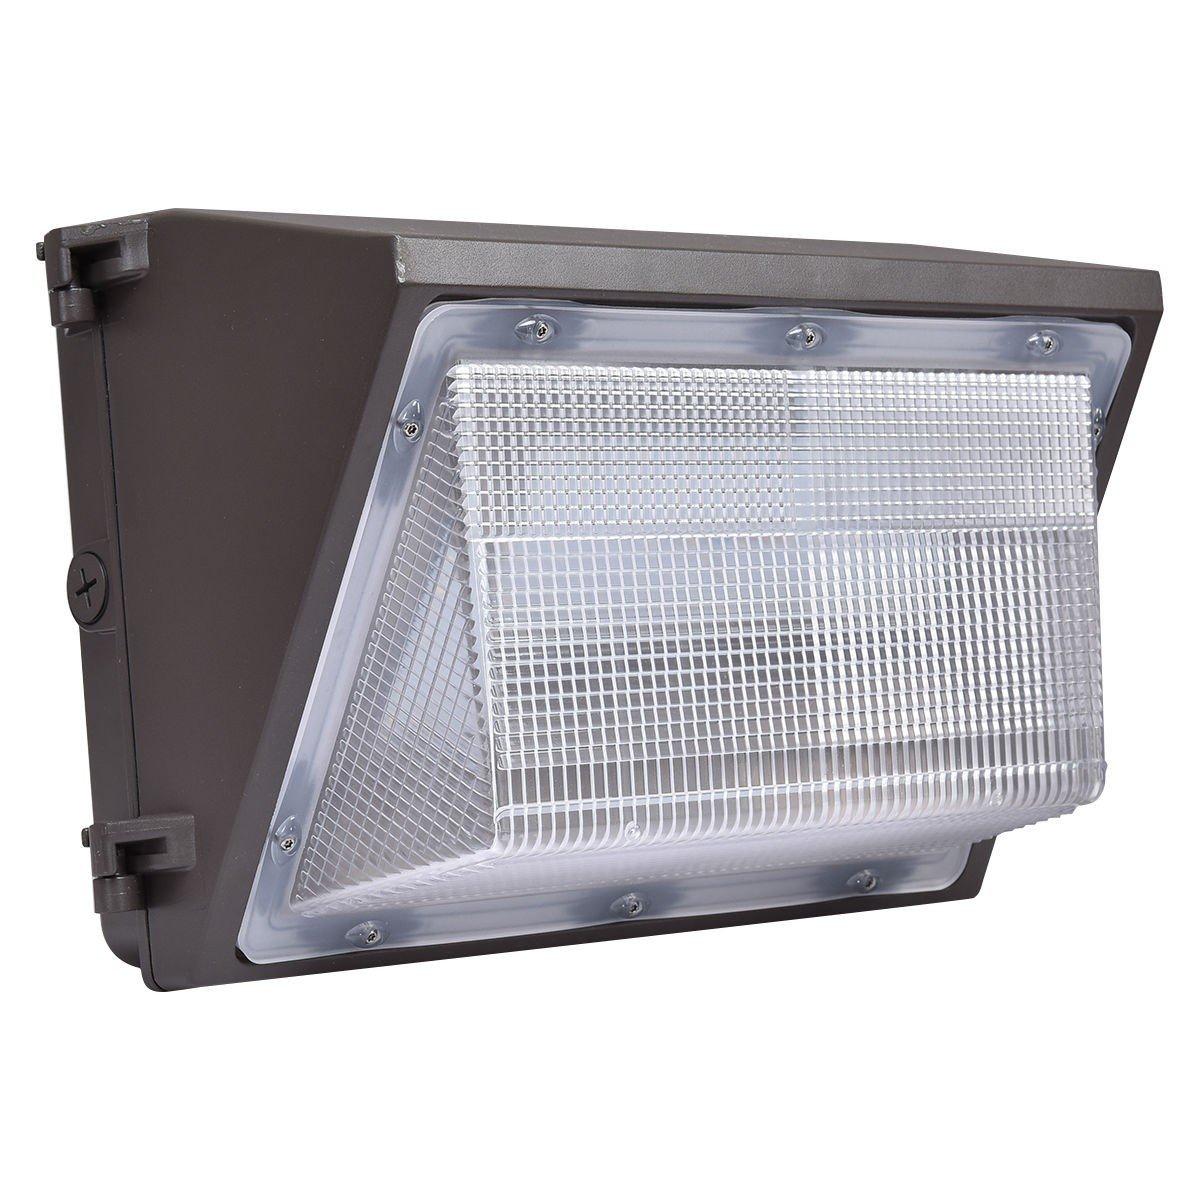 70W LED 5000K 8100 Lumens Waterproof Lamp DLC by Apontus